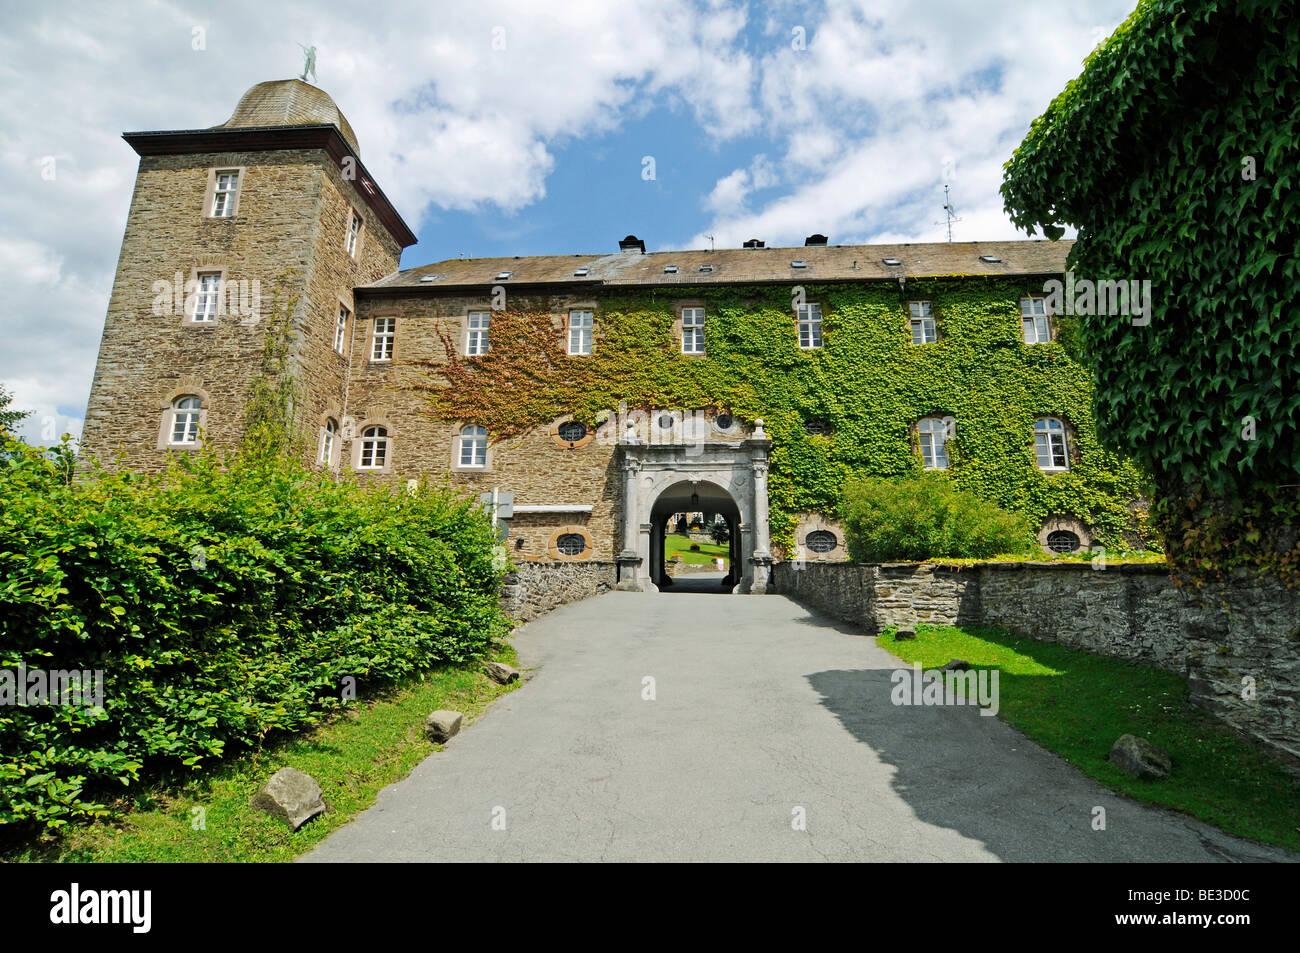 Entrance and drive, Burg Schnellenberg castle, Attendorn, Sauerland district, North Rhine-Westphalia, Germany, Europe Stock Photo